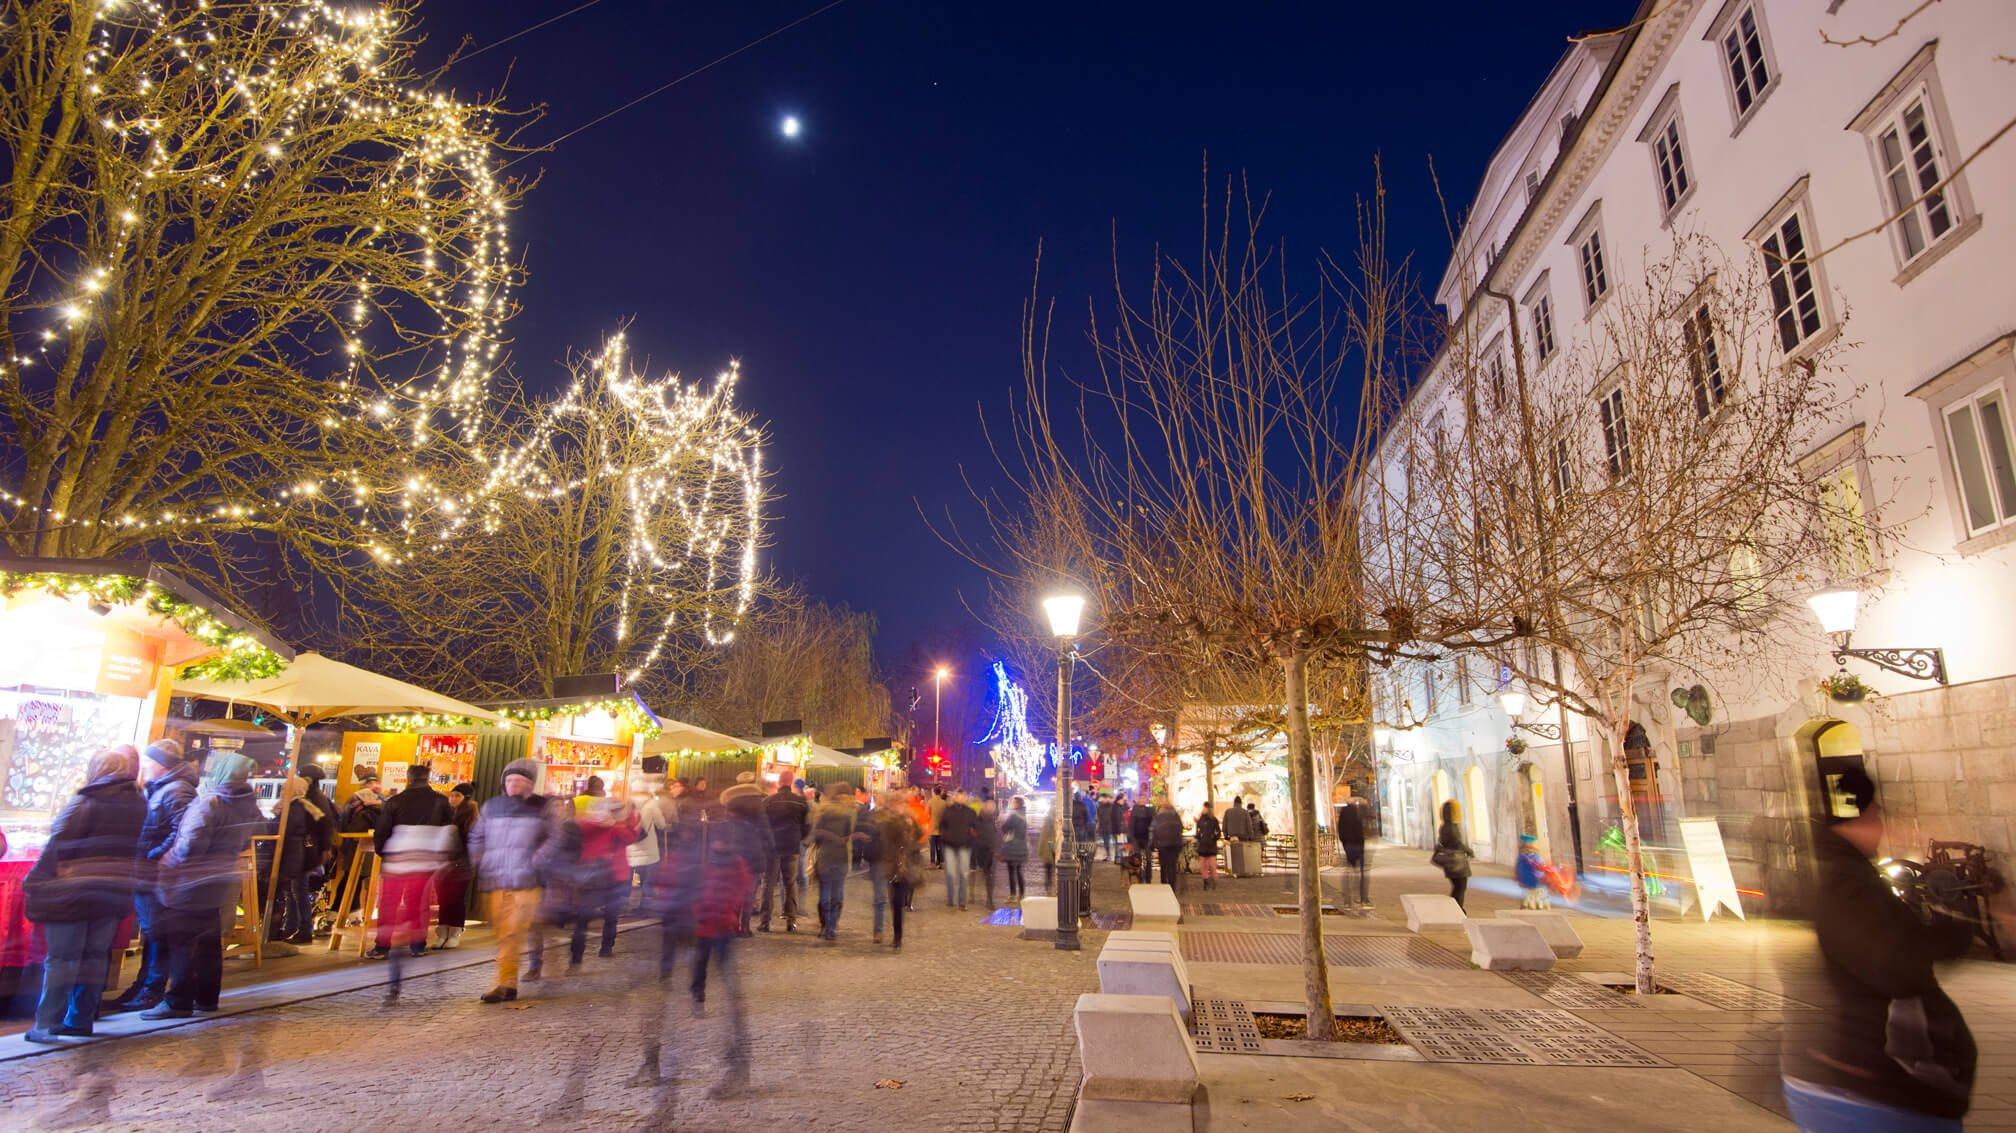 Festive December at your doorstep - Galeria River